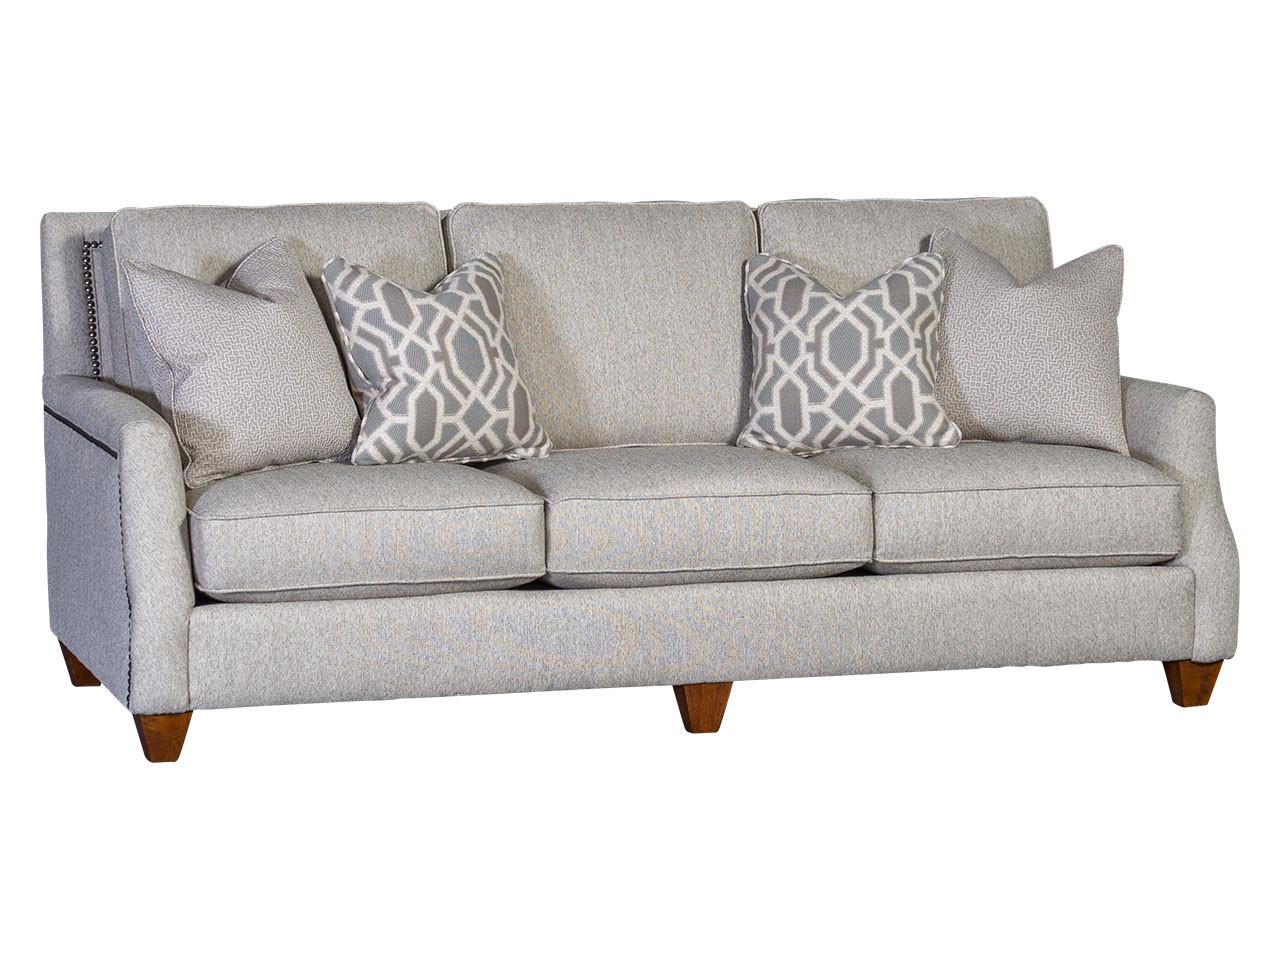 Transitional Fabric Sofa With Nailhead Trim, English Arm